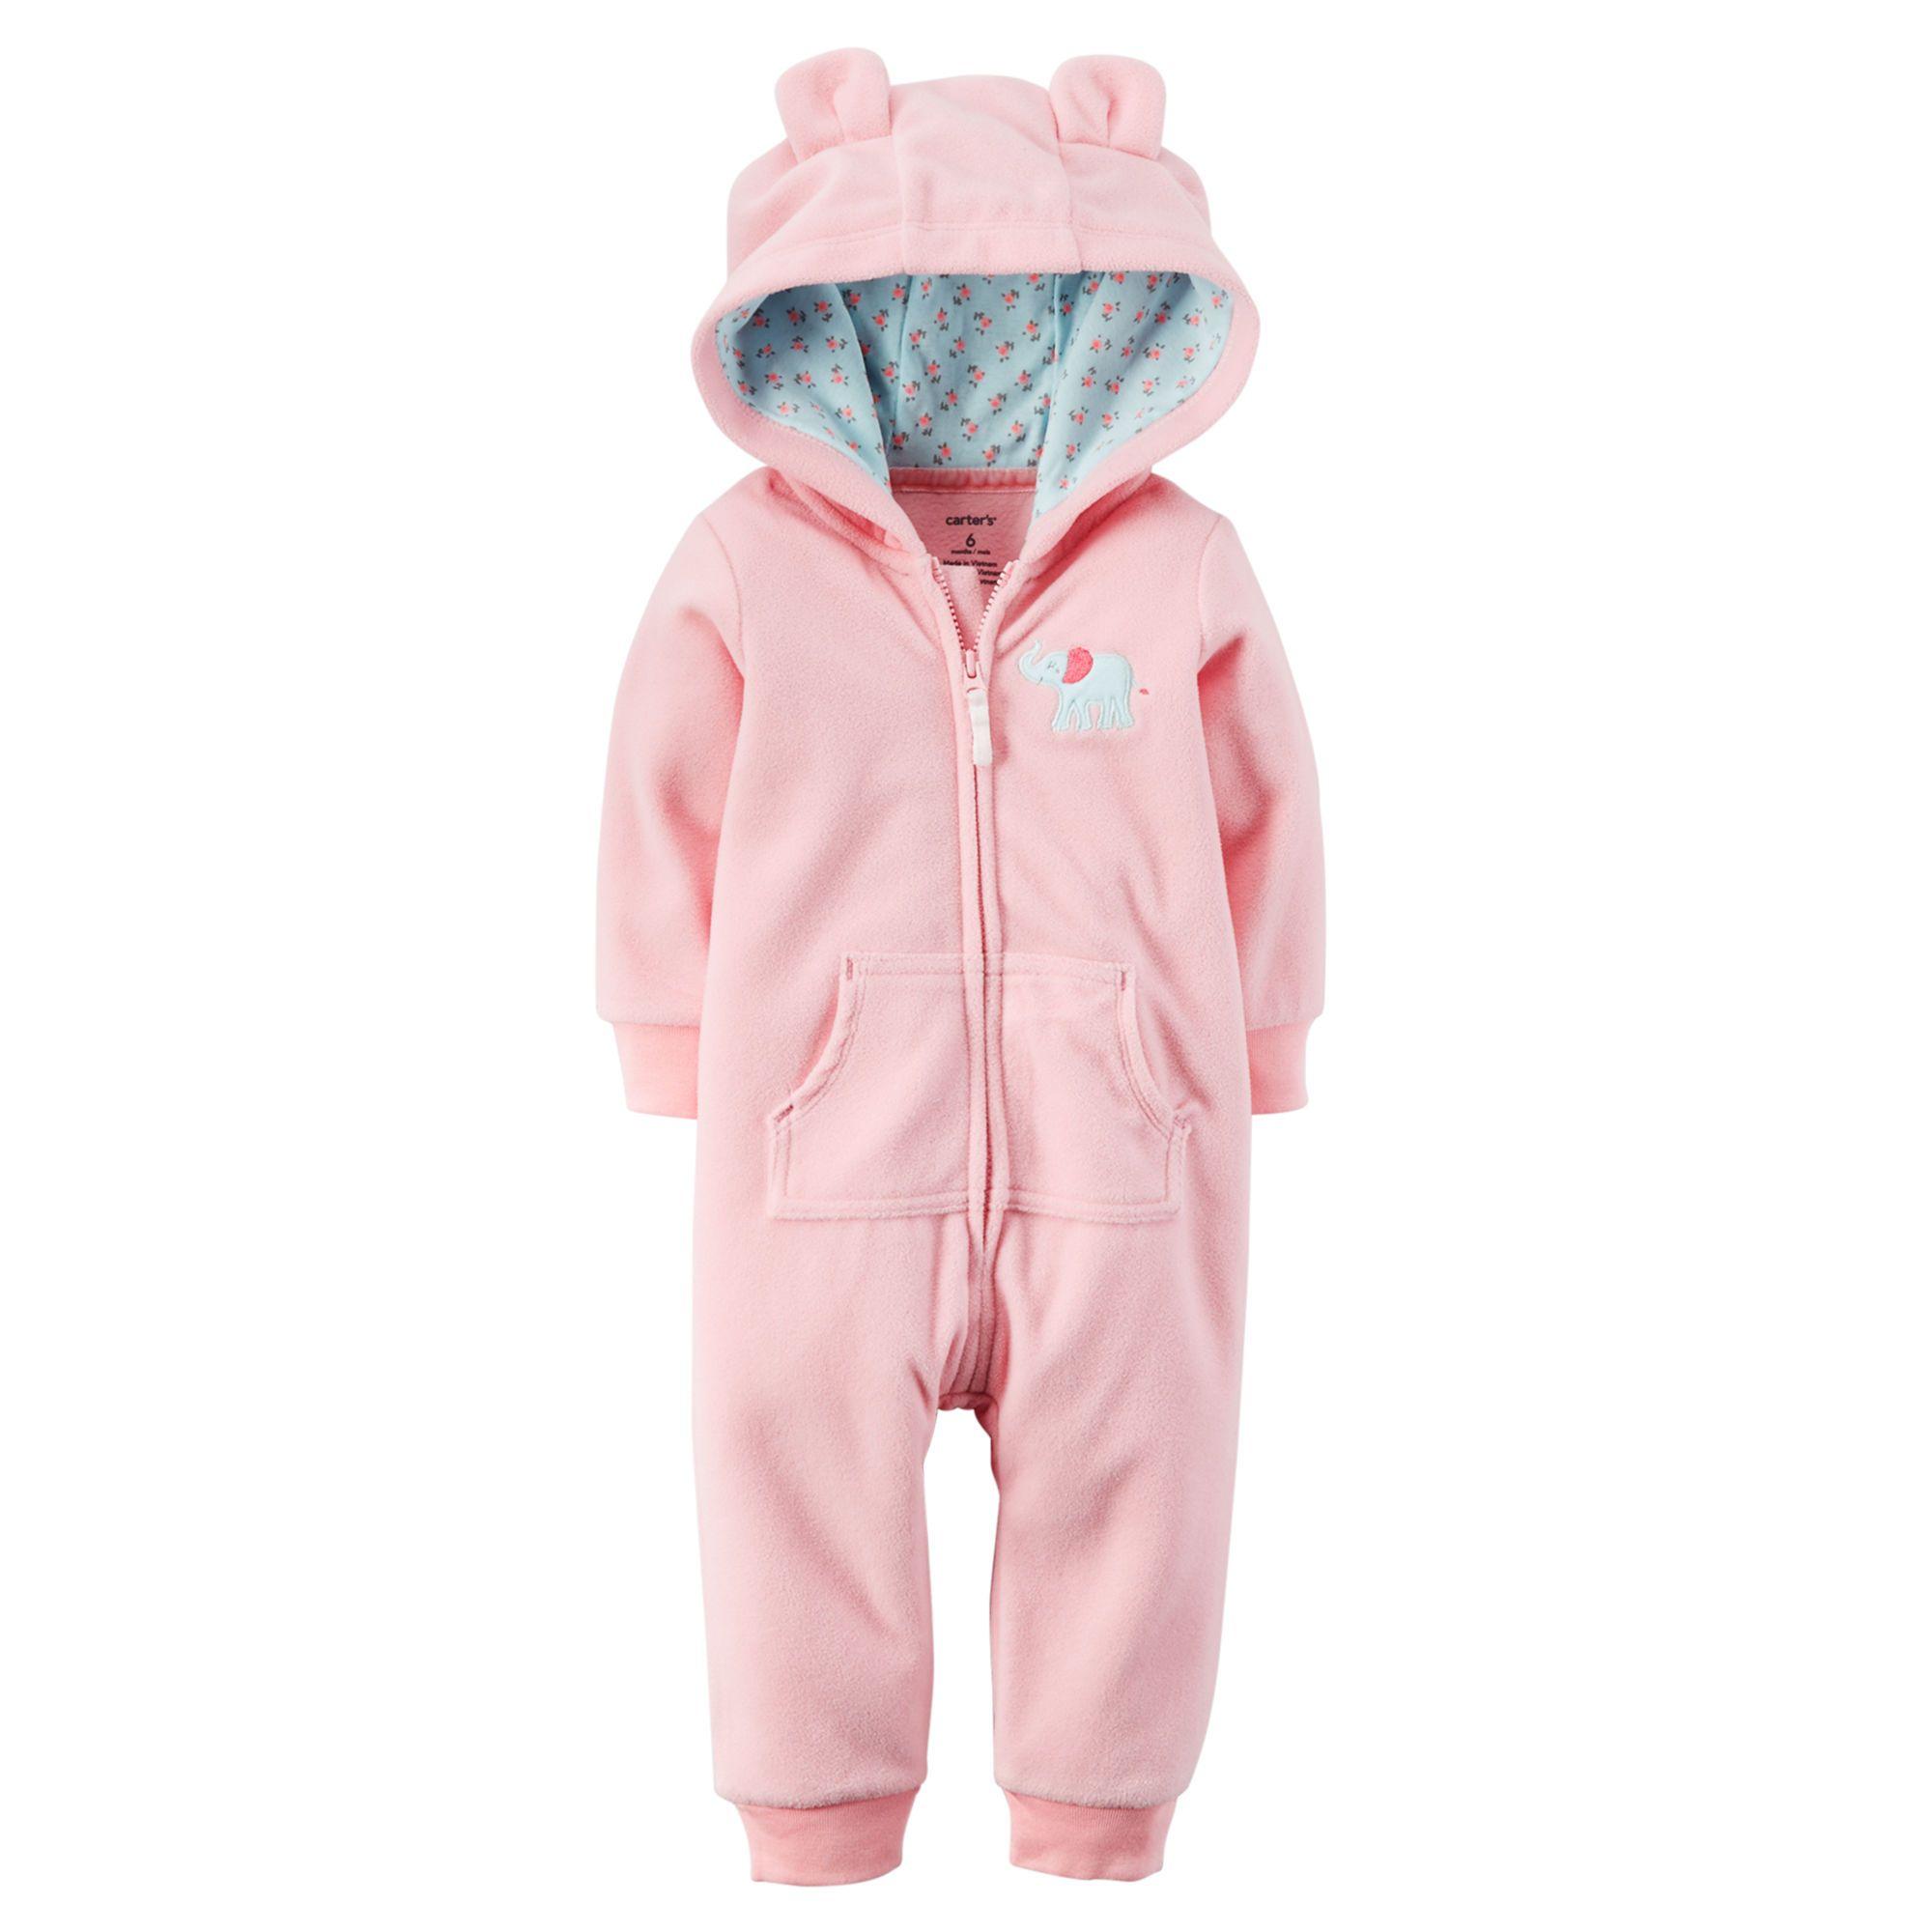 ed487fd954 Baby Bear Fleece Jumpsuit   Carters.com   A Princess Maybe?   Baby ...